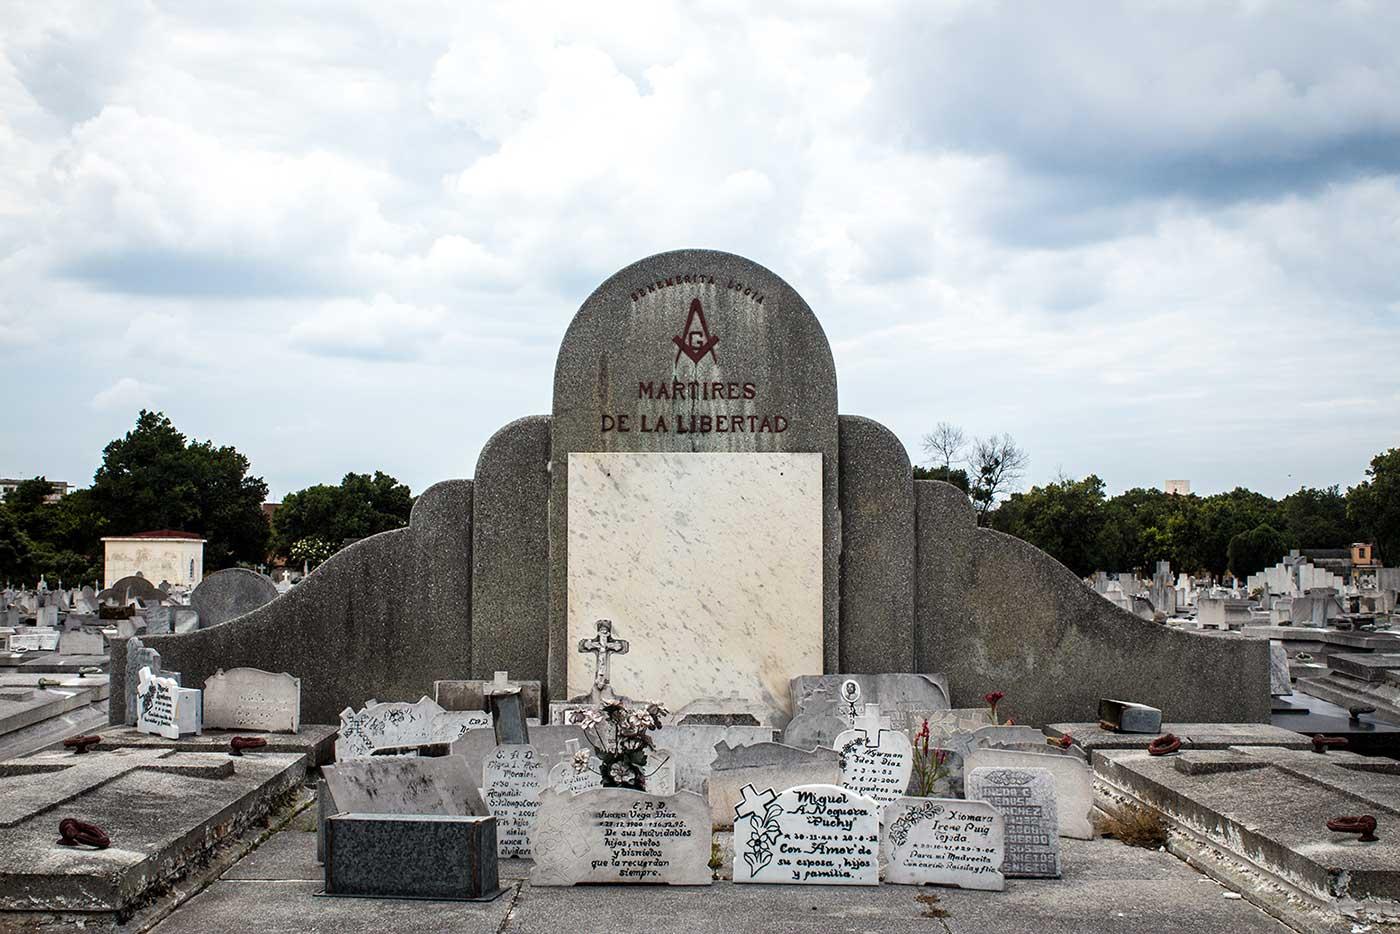 Memorial plot for 'Logia Mártires de la Libertad': Necrópolis Cristóbal Colón, Havana, Cuba.